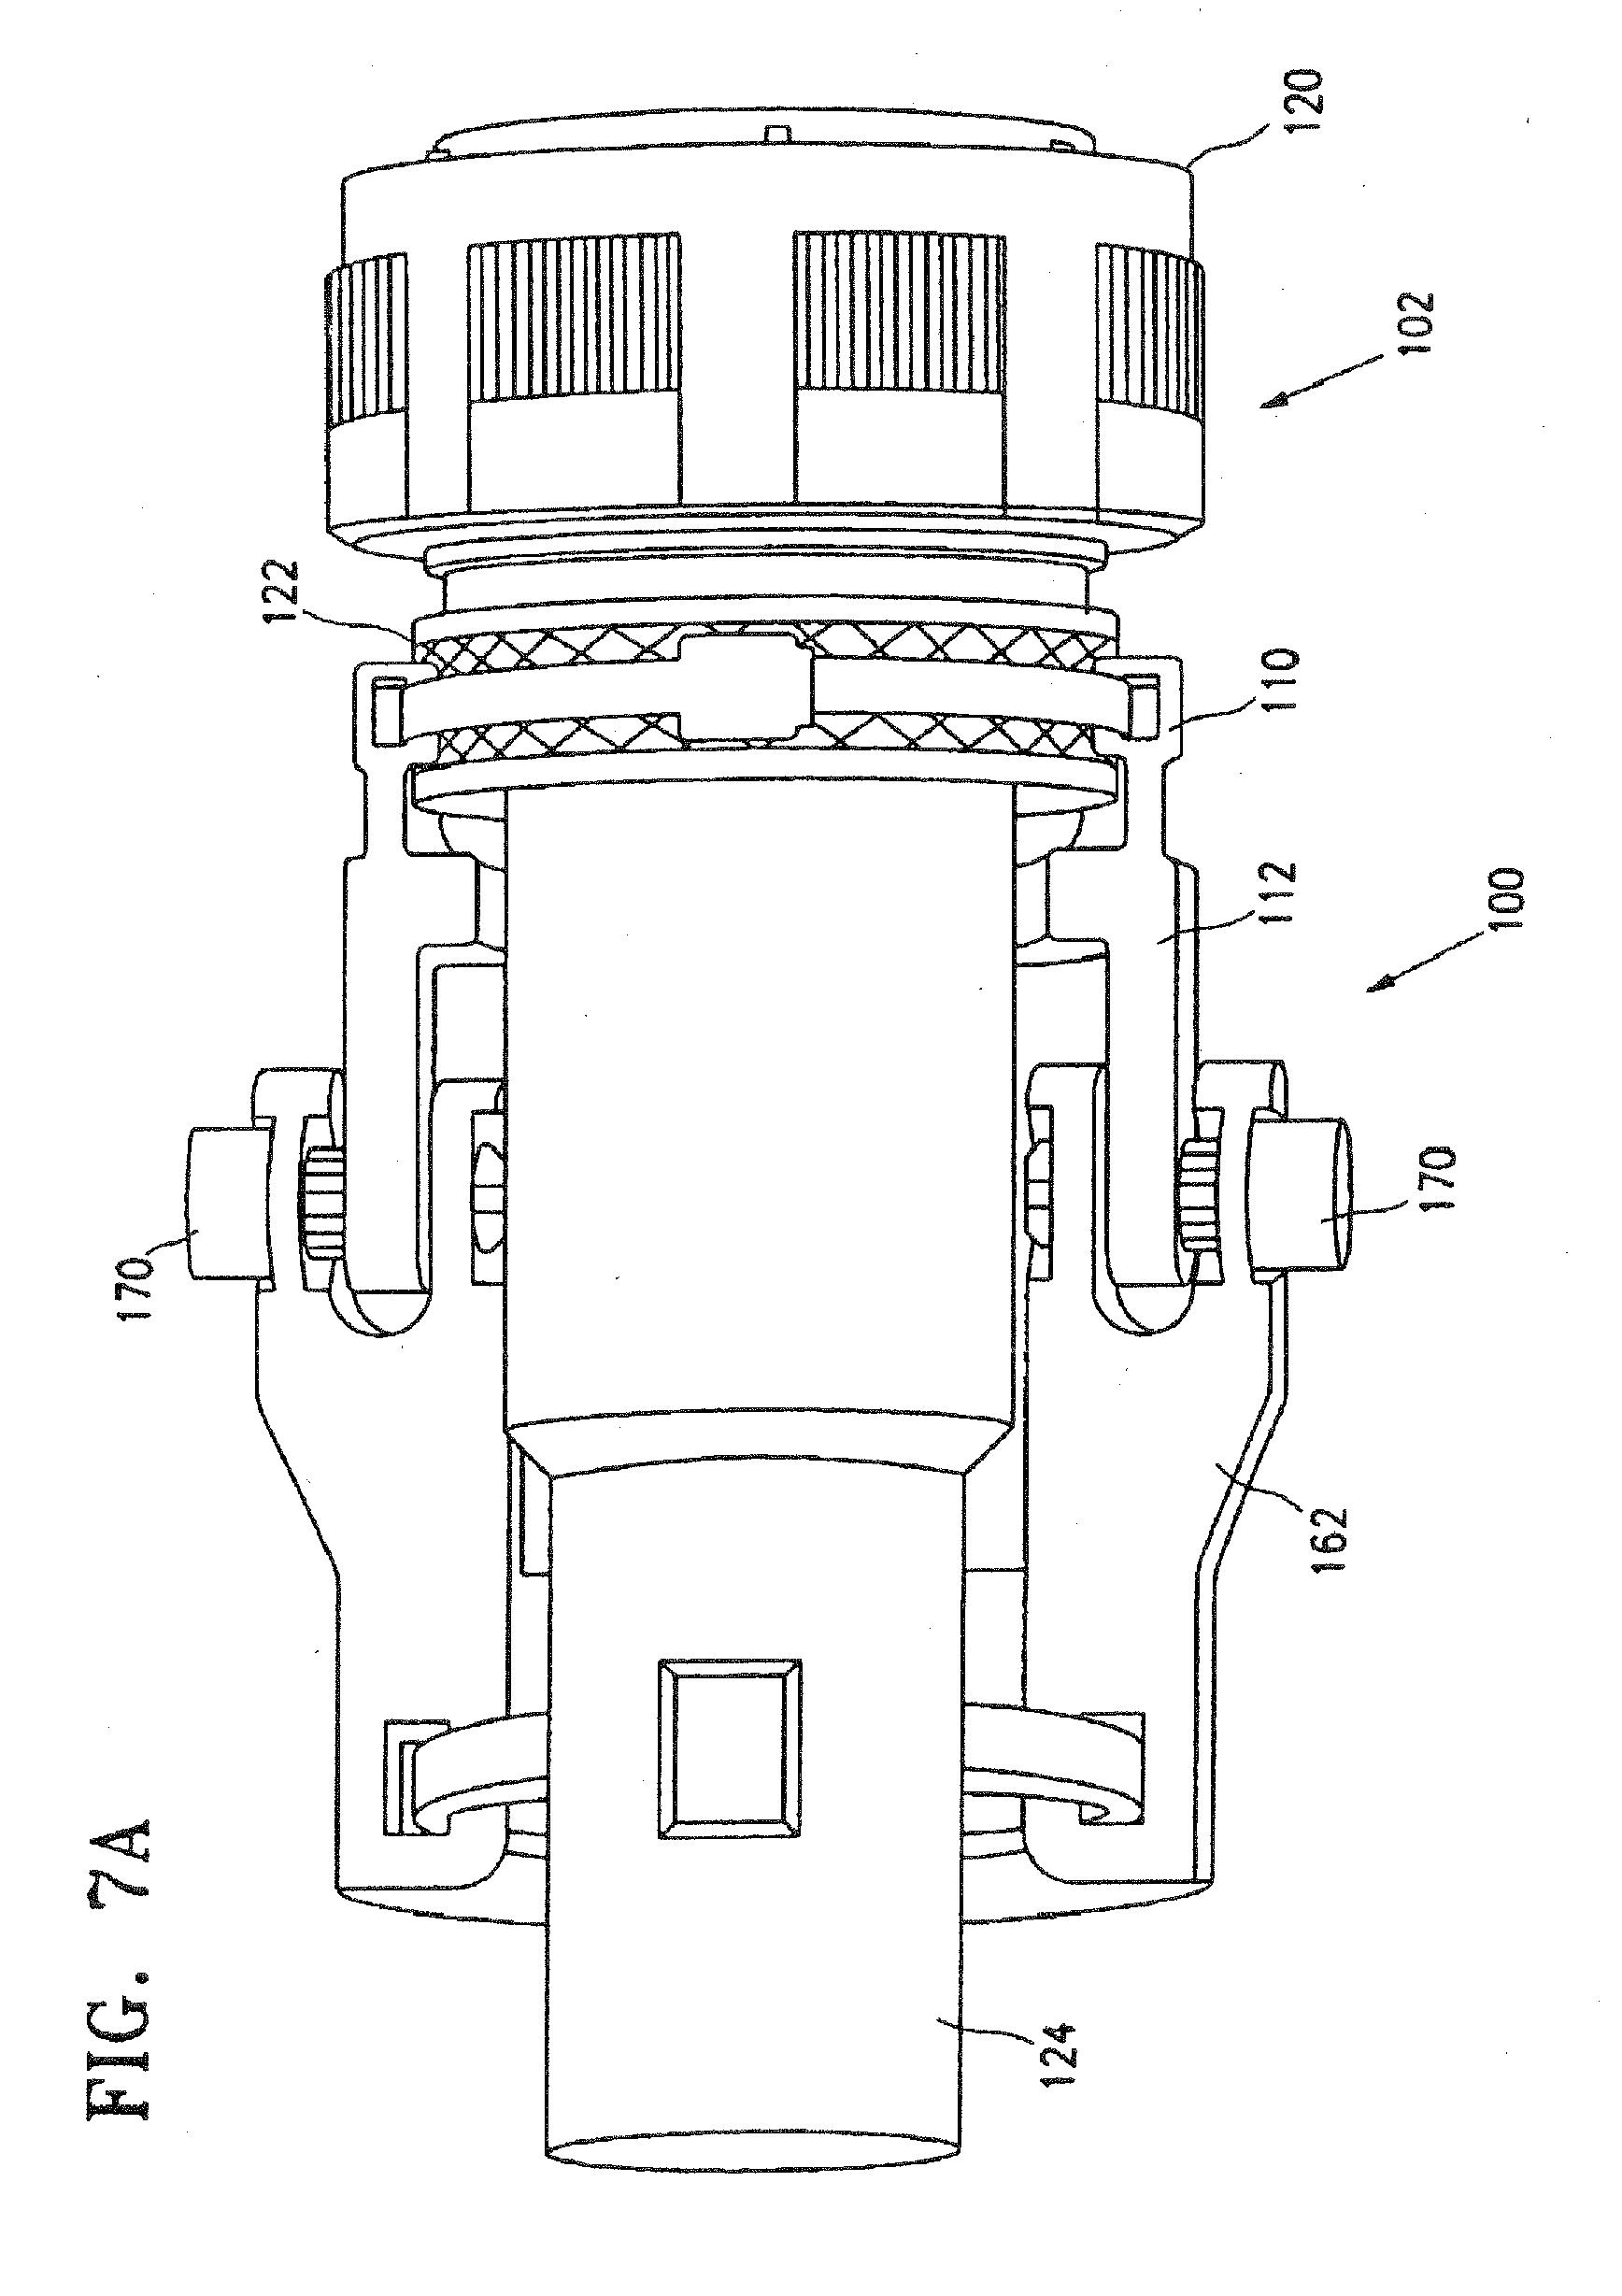 patent ep2053701a1